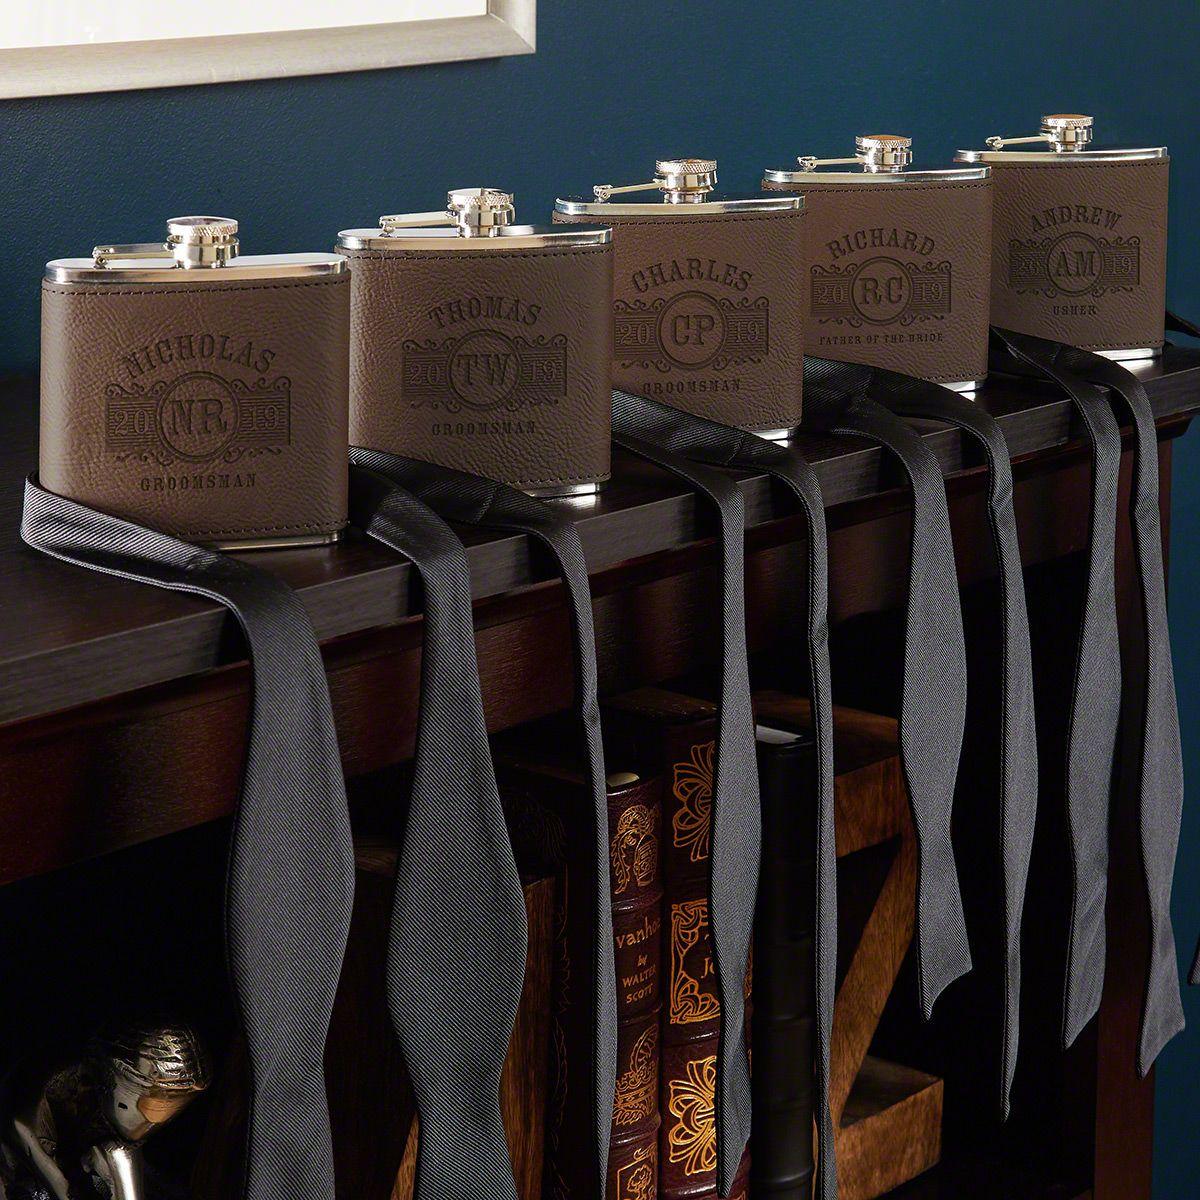 Marquee Fitzgerald Custom Flasks for Groomsmen – Set of 5